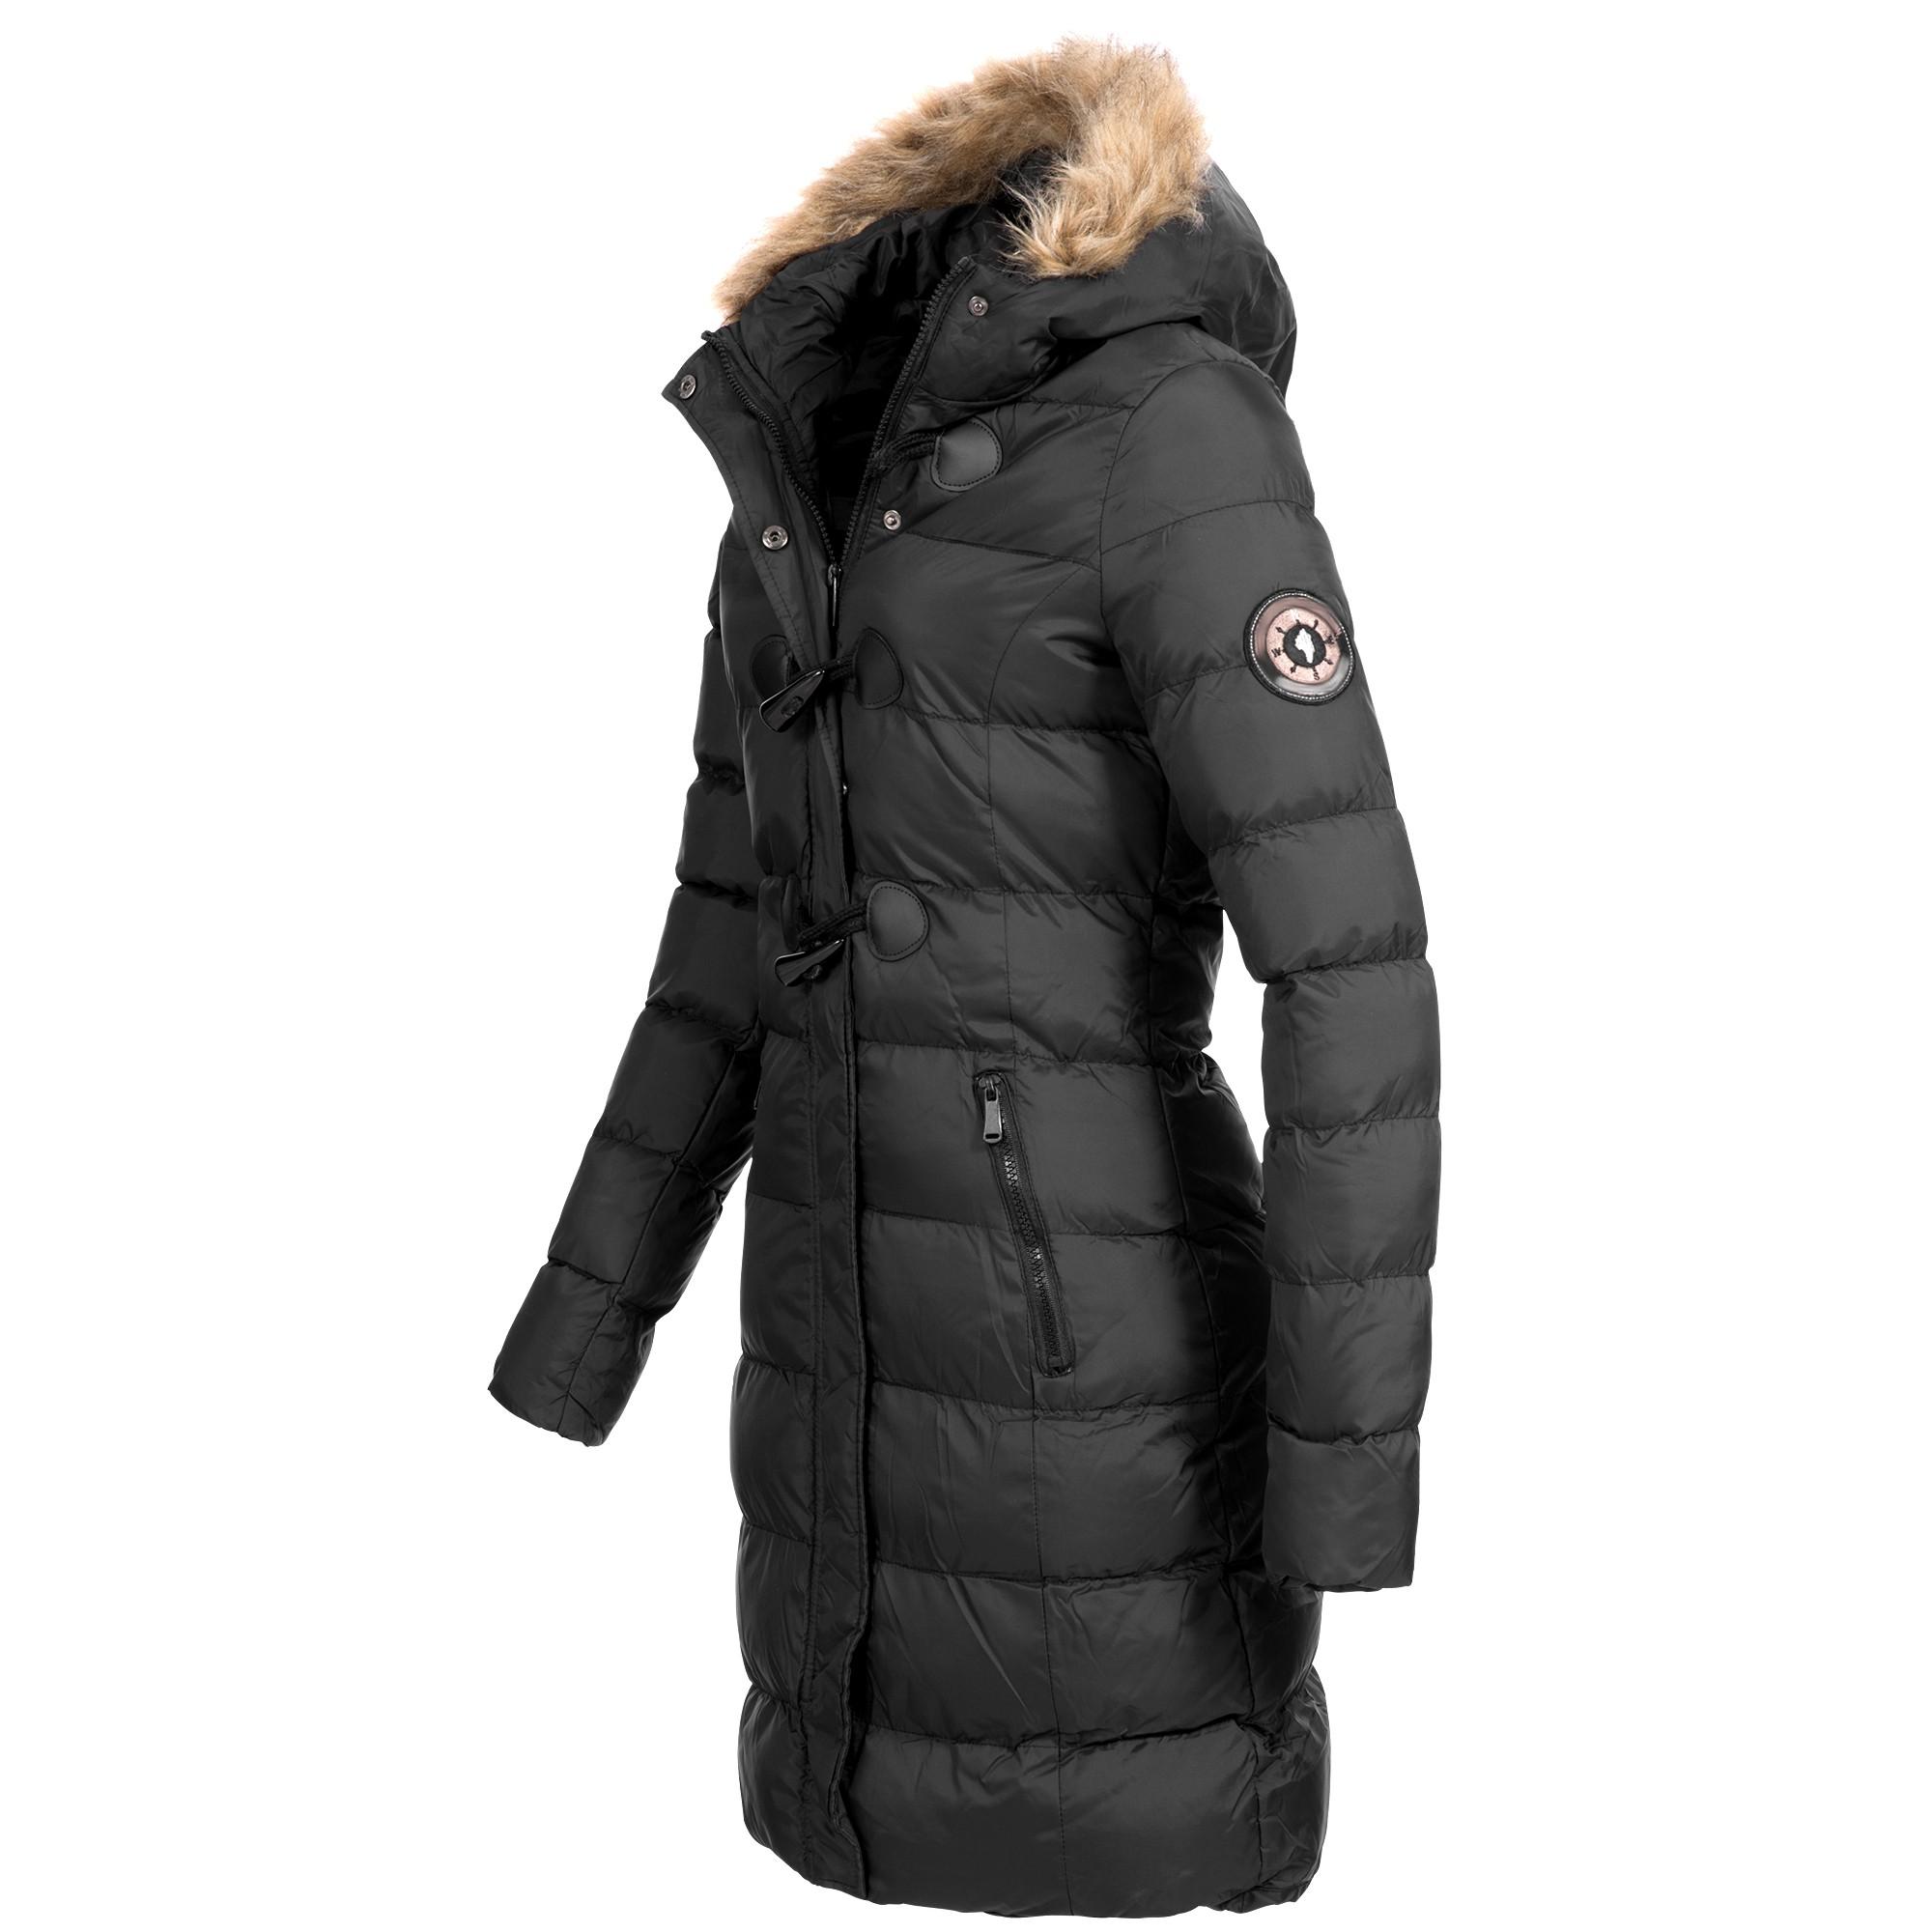 detailed look 90b27 f2c24 Brave Soul Damen Steppmantel Winter Mantel Parka Jacke warm S-XXL AZ29  4-Farben